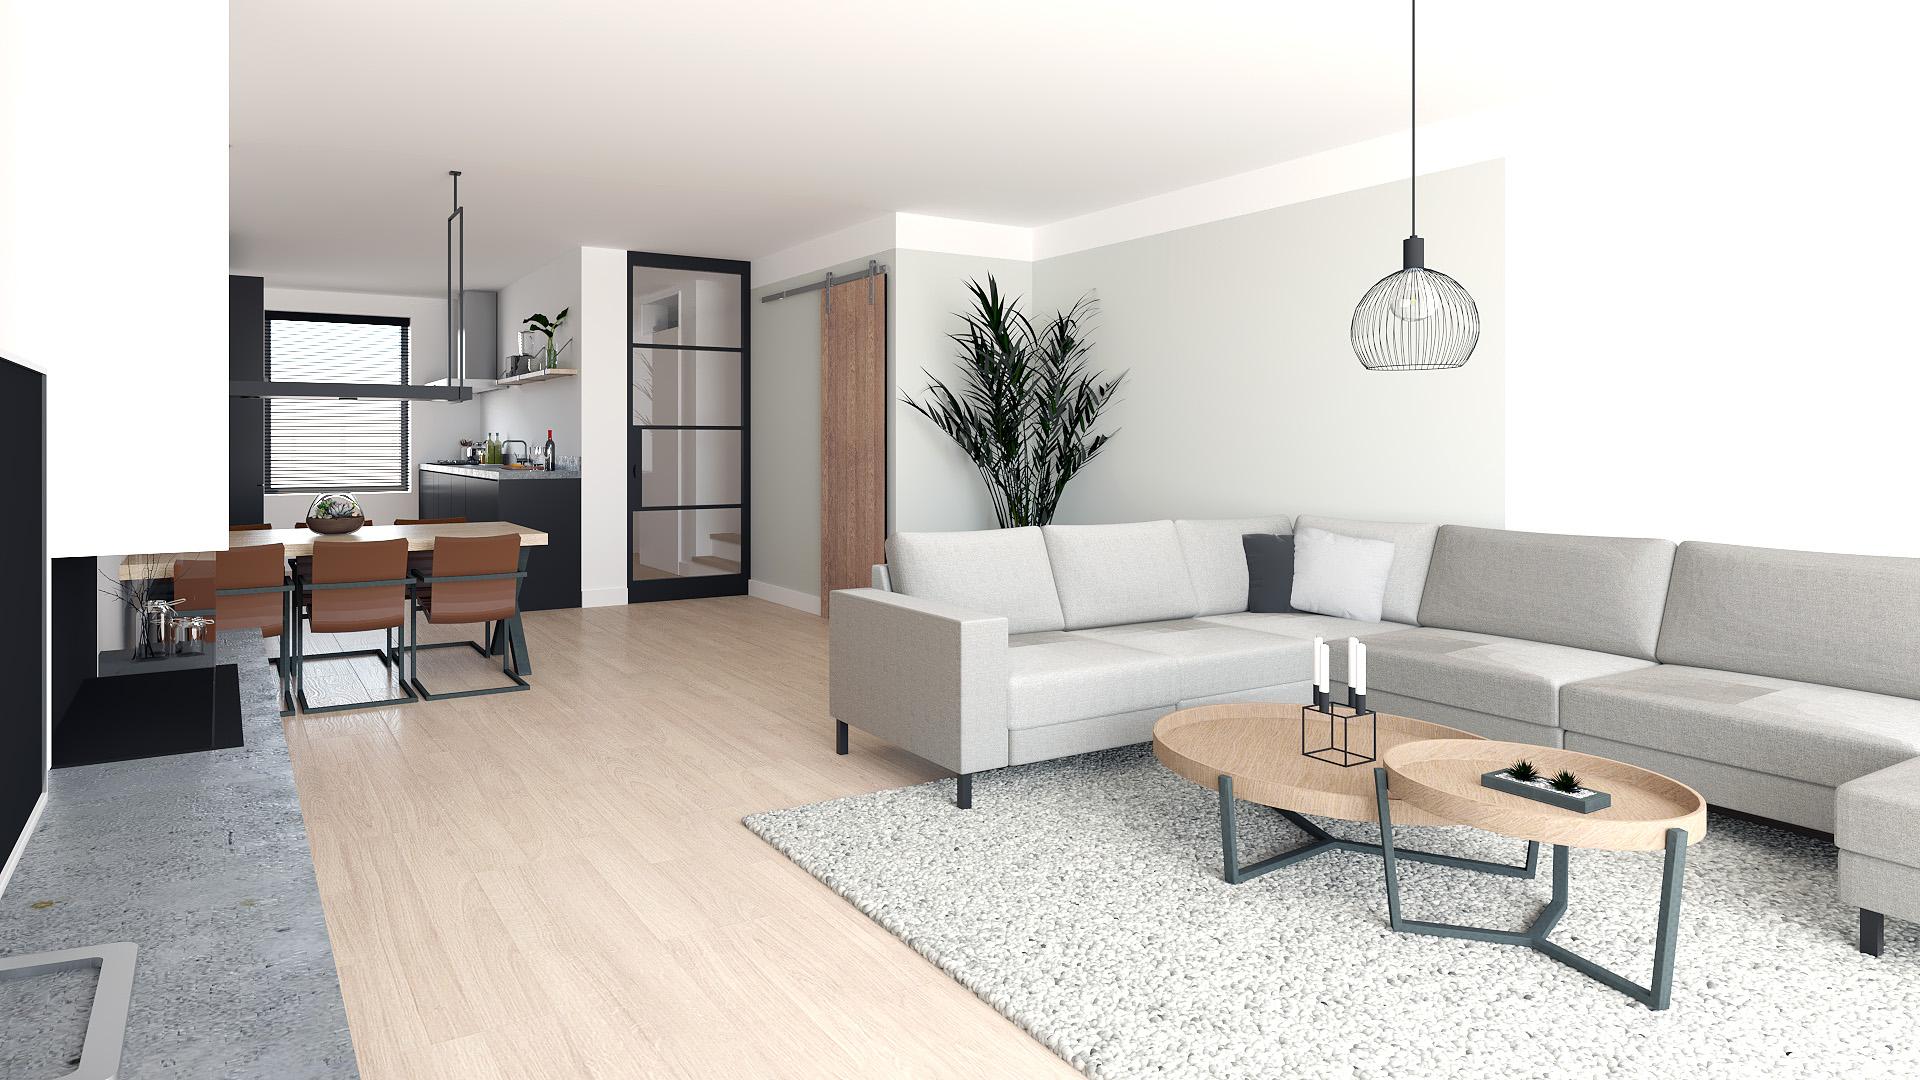 Interieur impressie nieuwbouwwoning Hoef en Haag